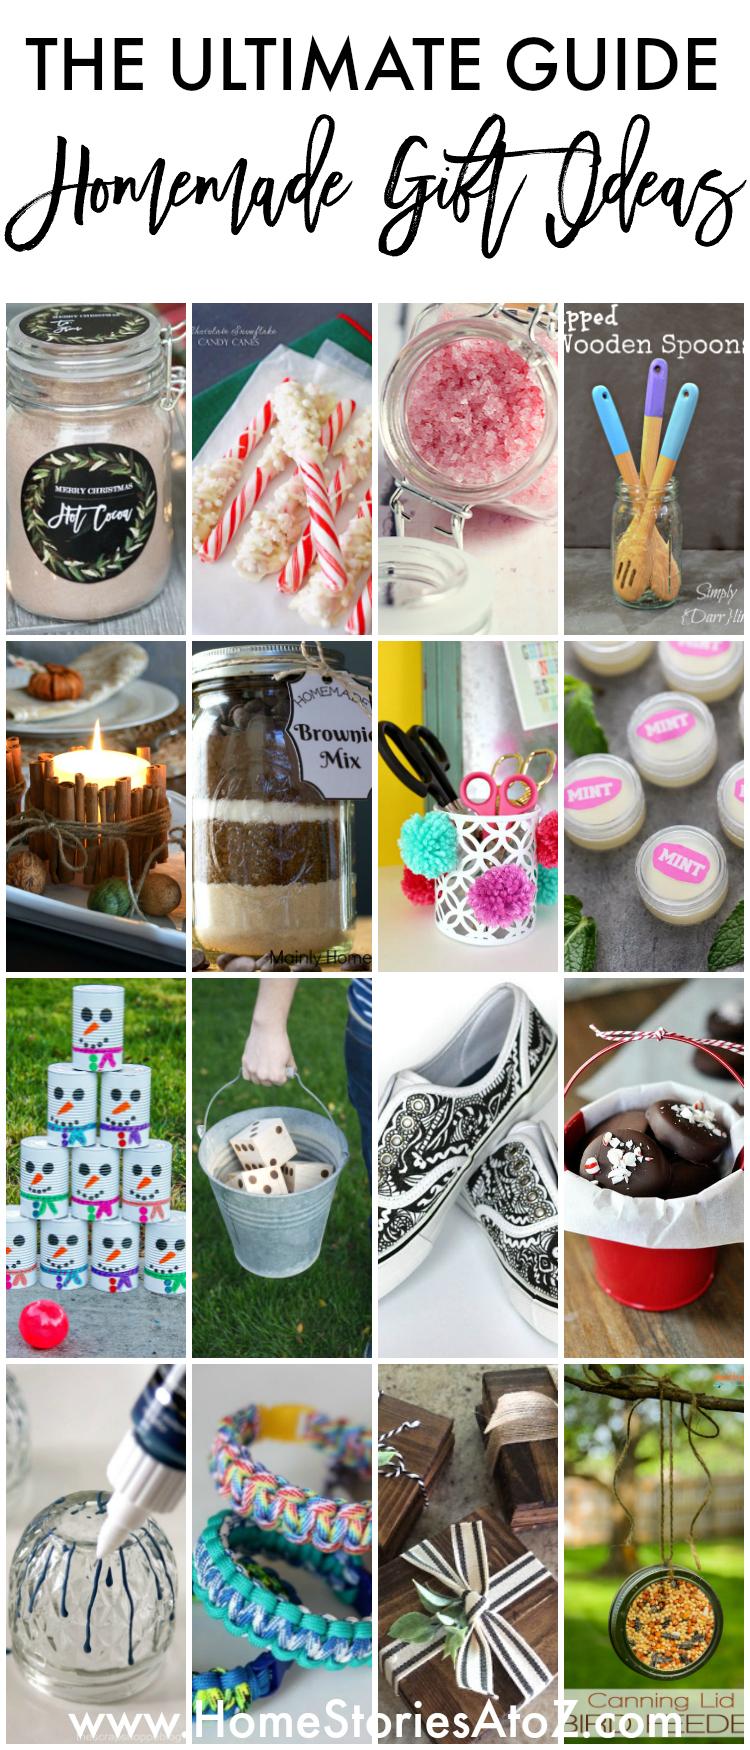 90+ Homemade Gift Ideas